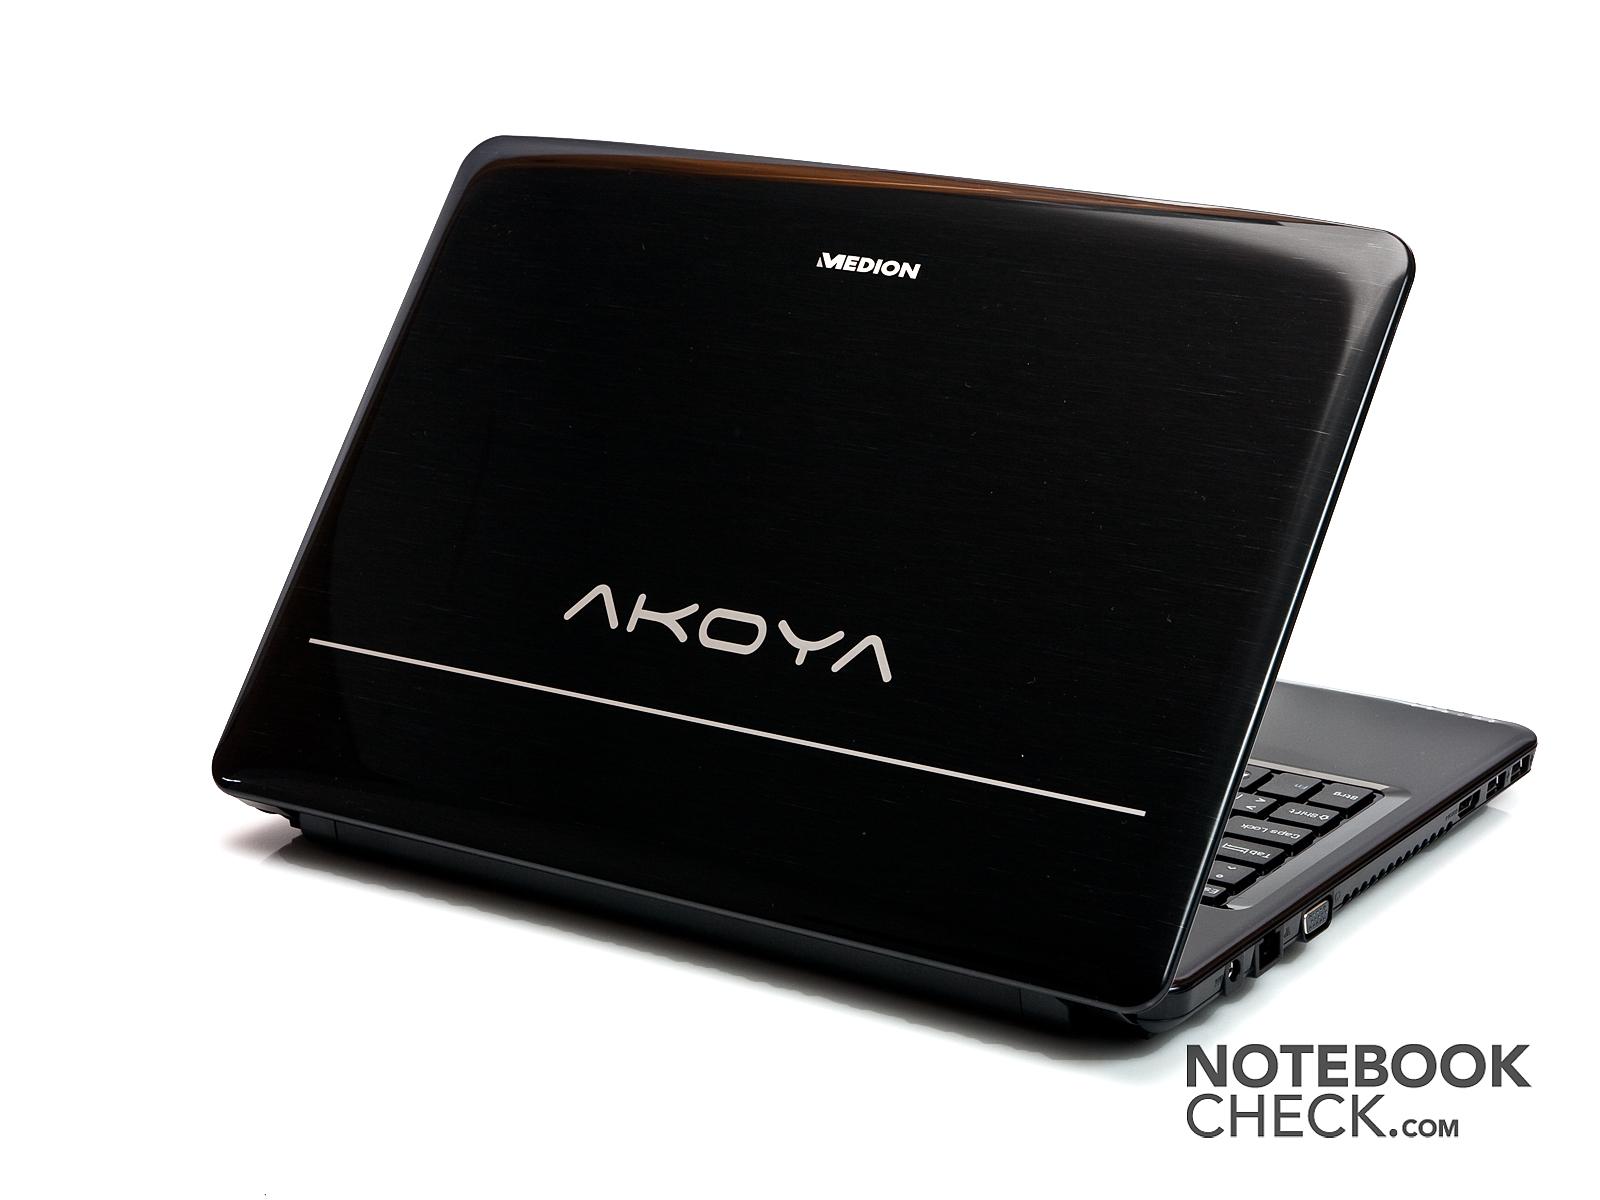 akoya laptop Medion